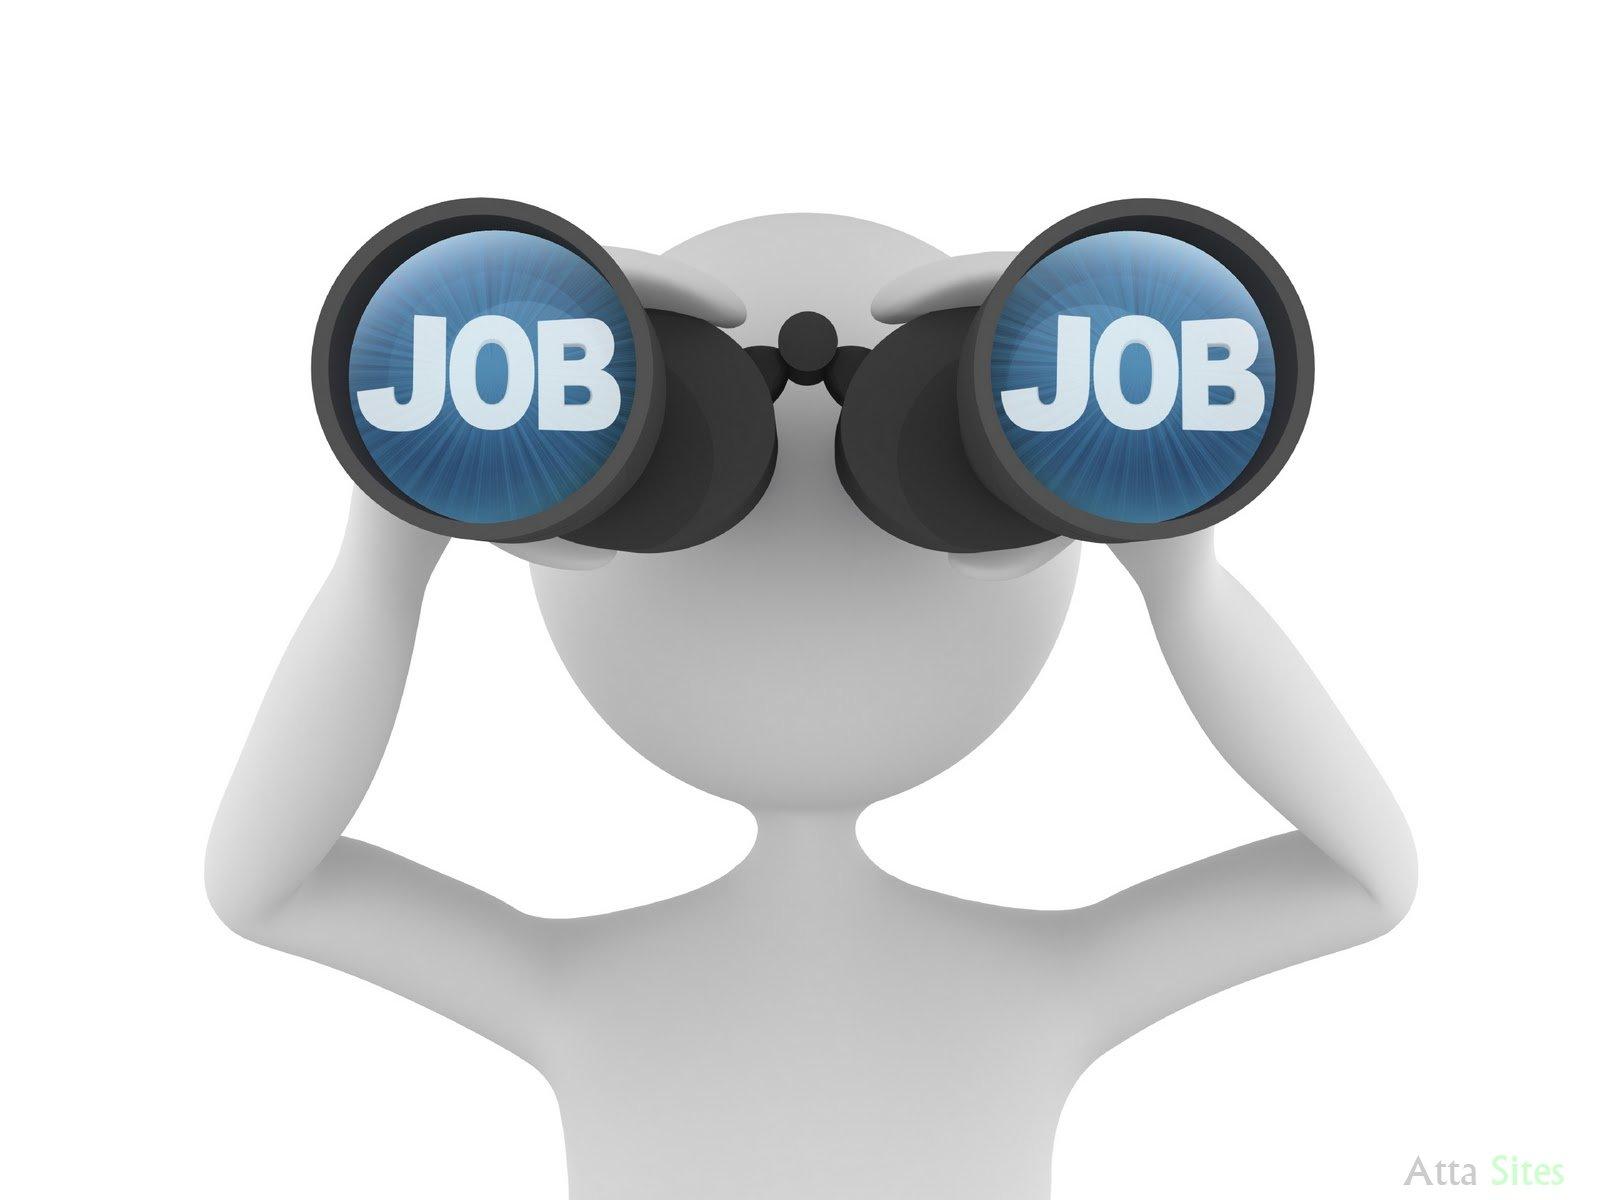 Info Loker Di Soppeng Info Lowongan Kerja Terbaru Jobsid September 2016 Lowongan Kerja Samarinda Lokerz